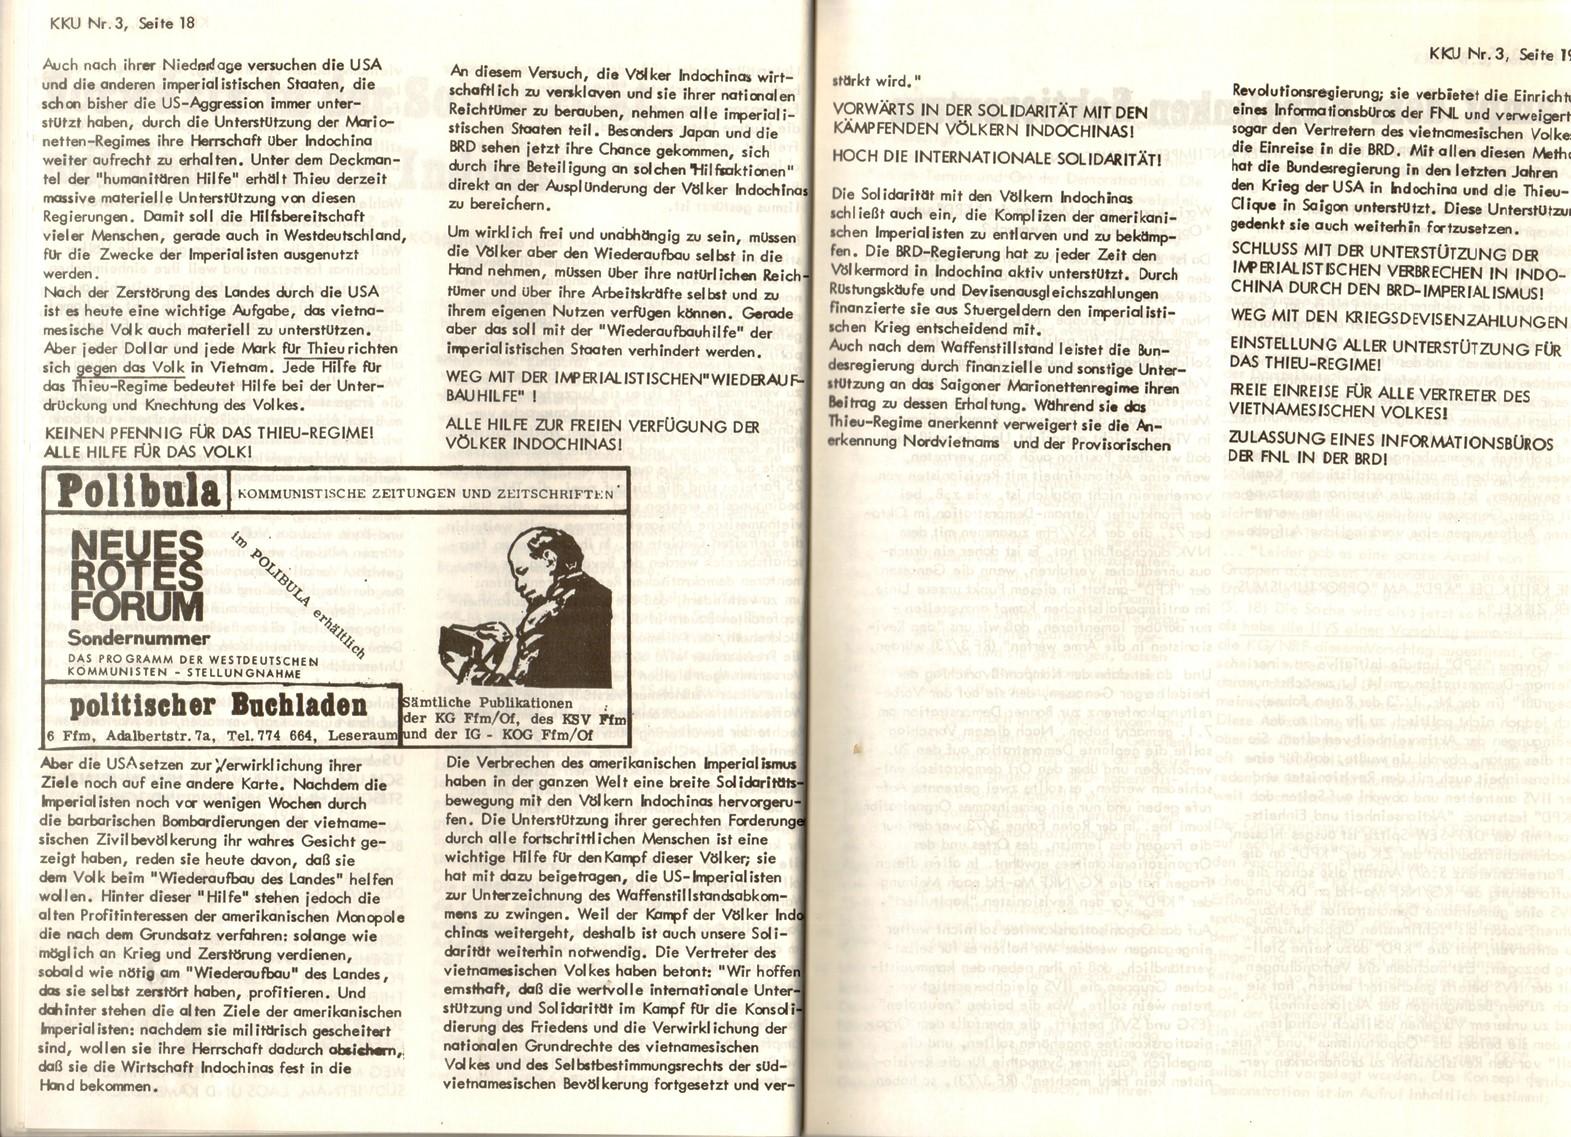 Frankfurt_Offenbach_KG_Kampf_Kritik_Umgestaltung_1973_03_11